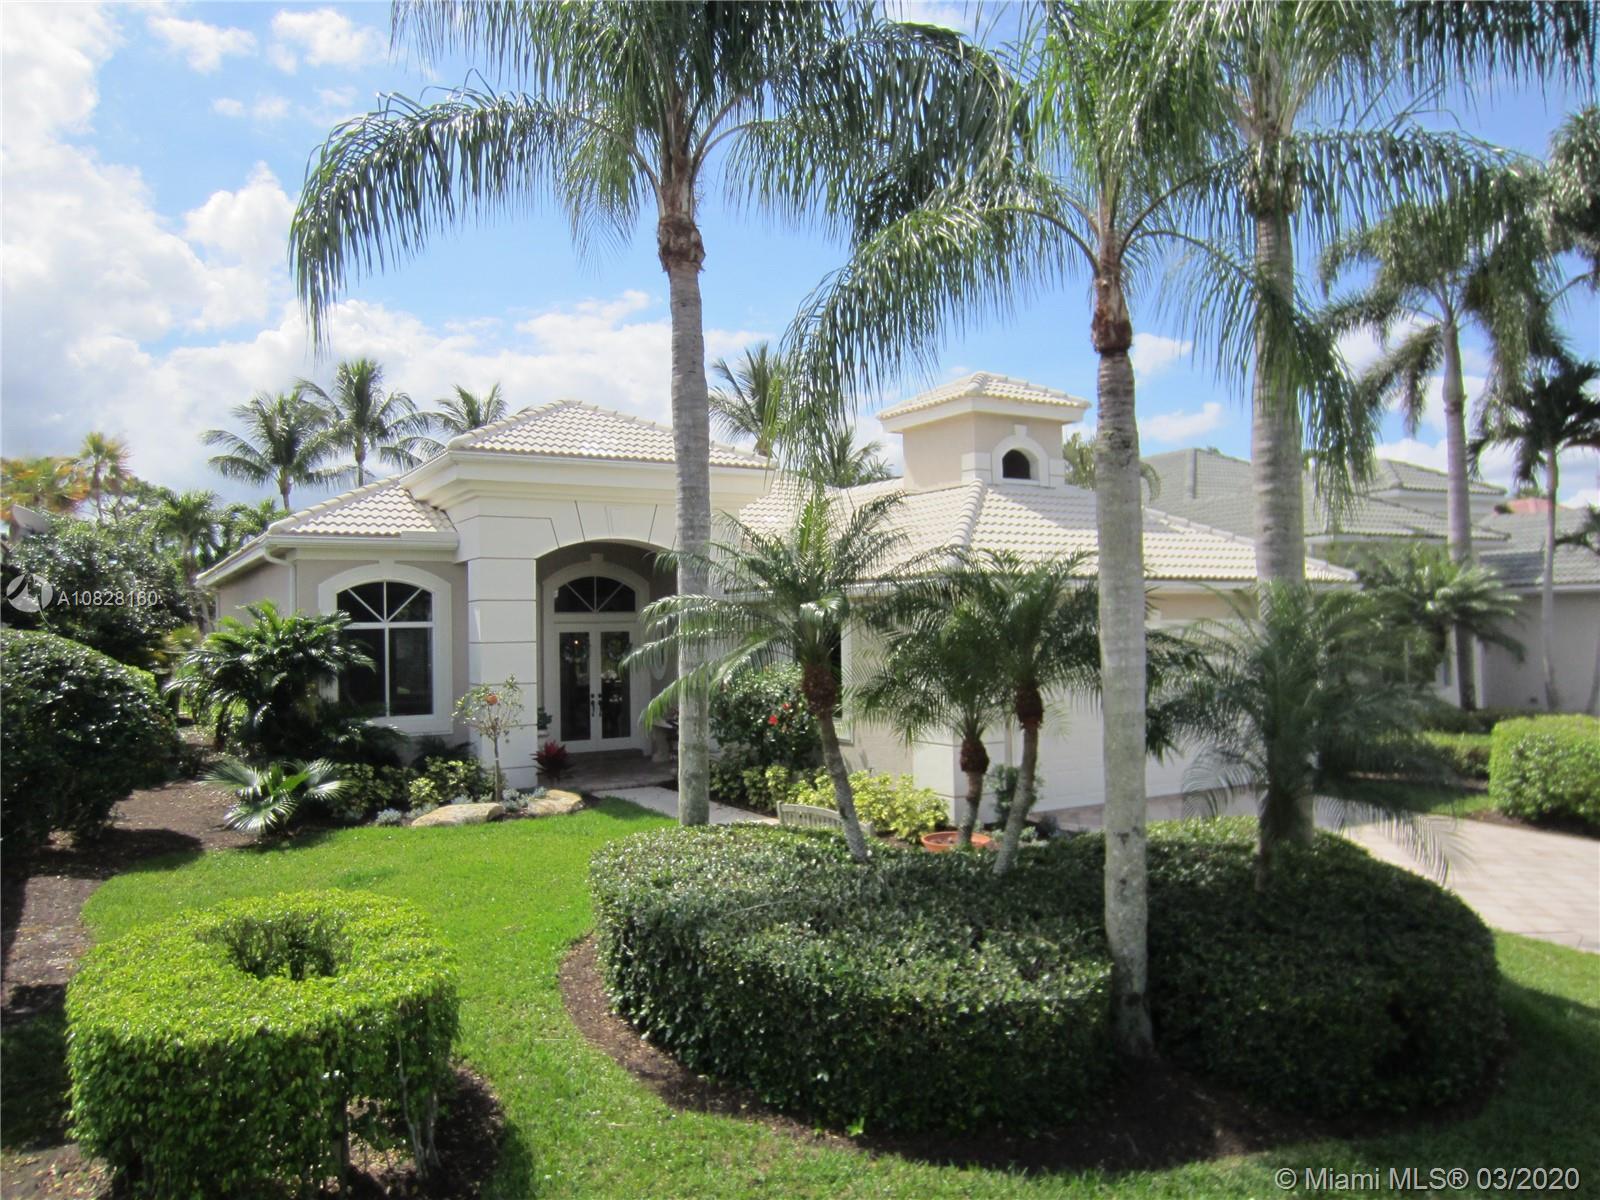 6756 Oakmont Way, West Palm Beach, FL 33412